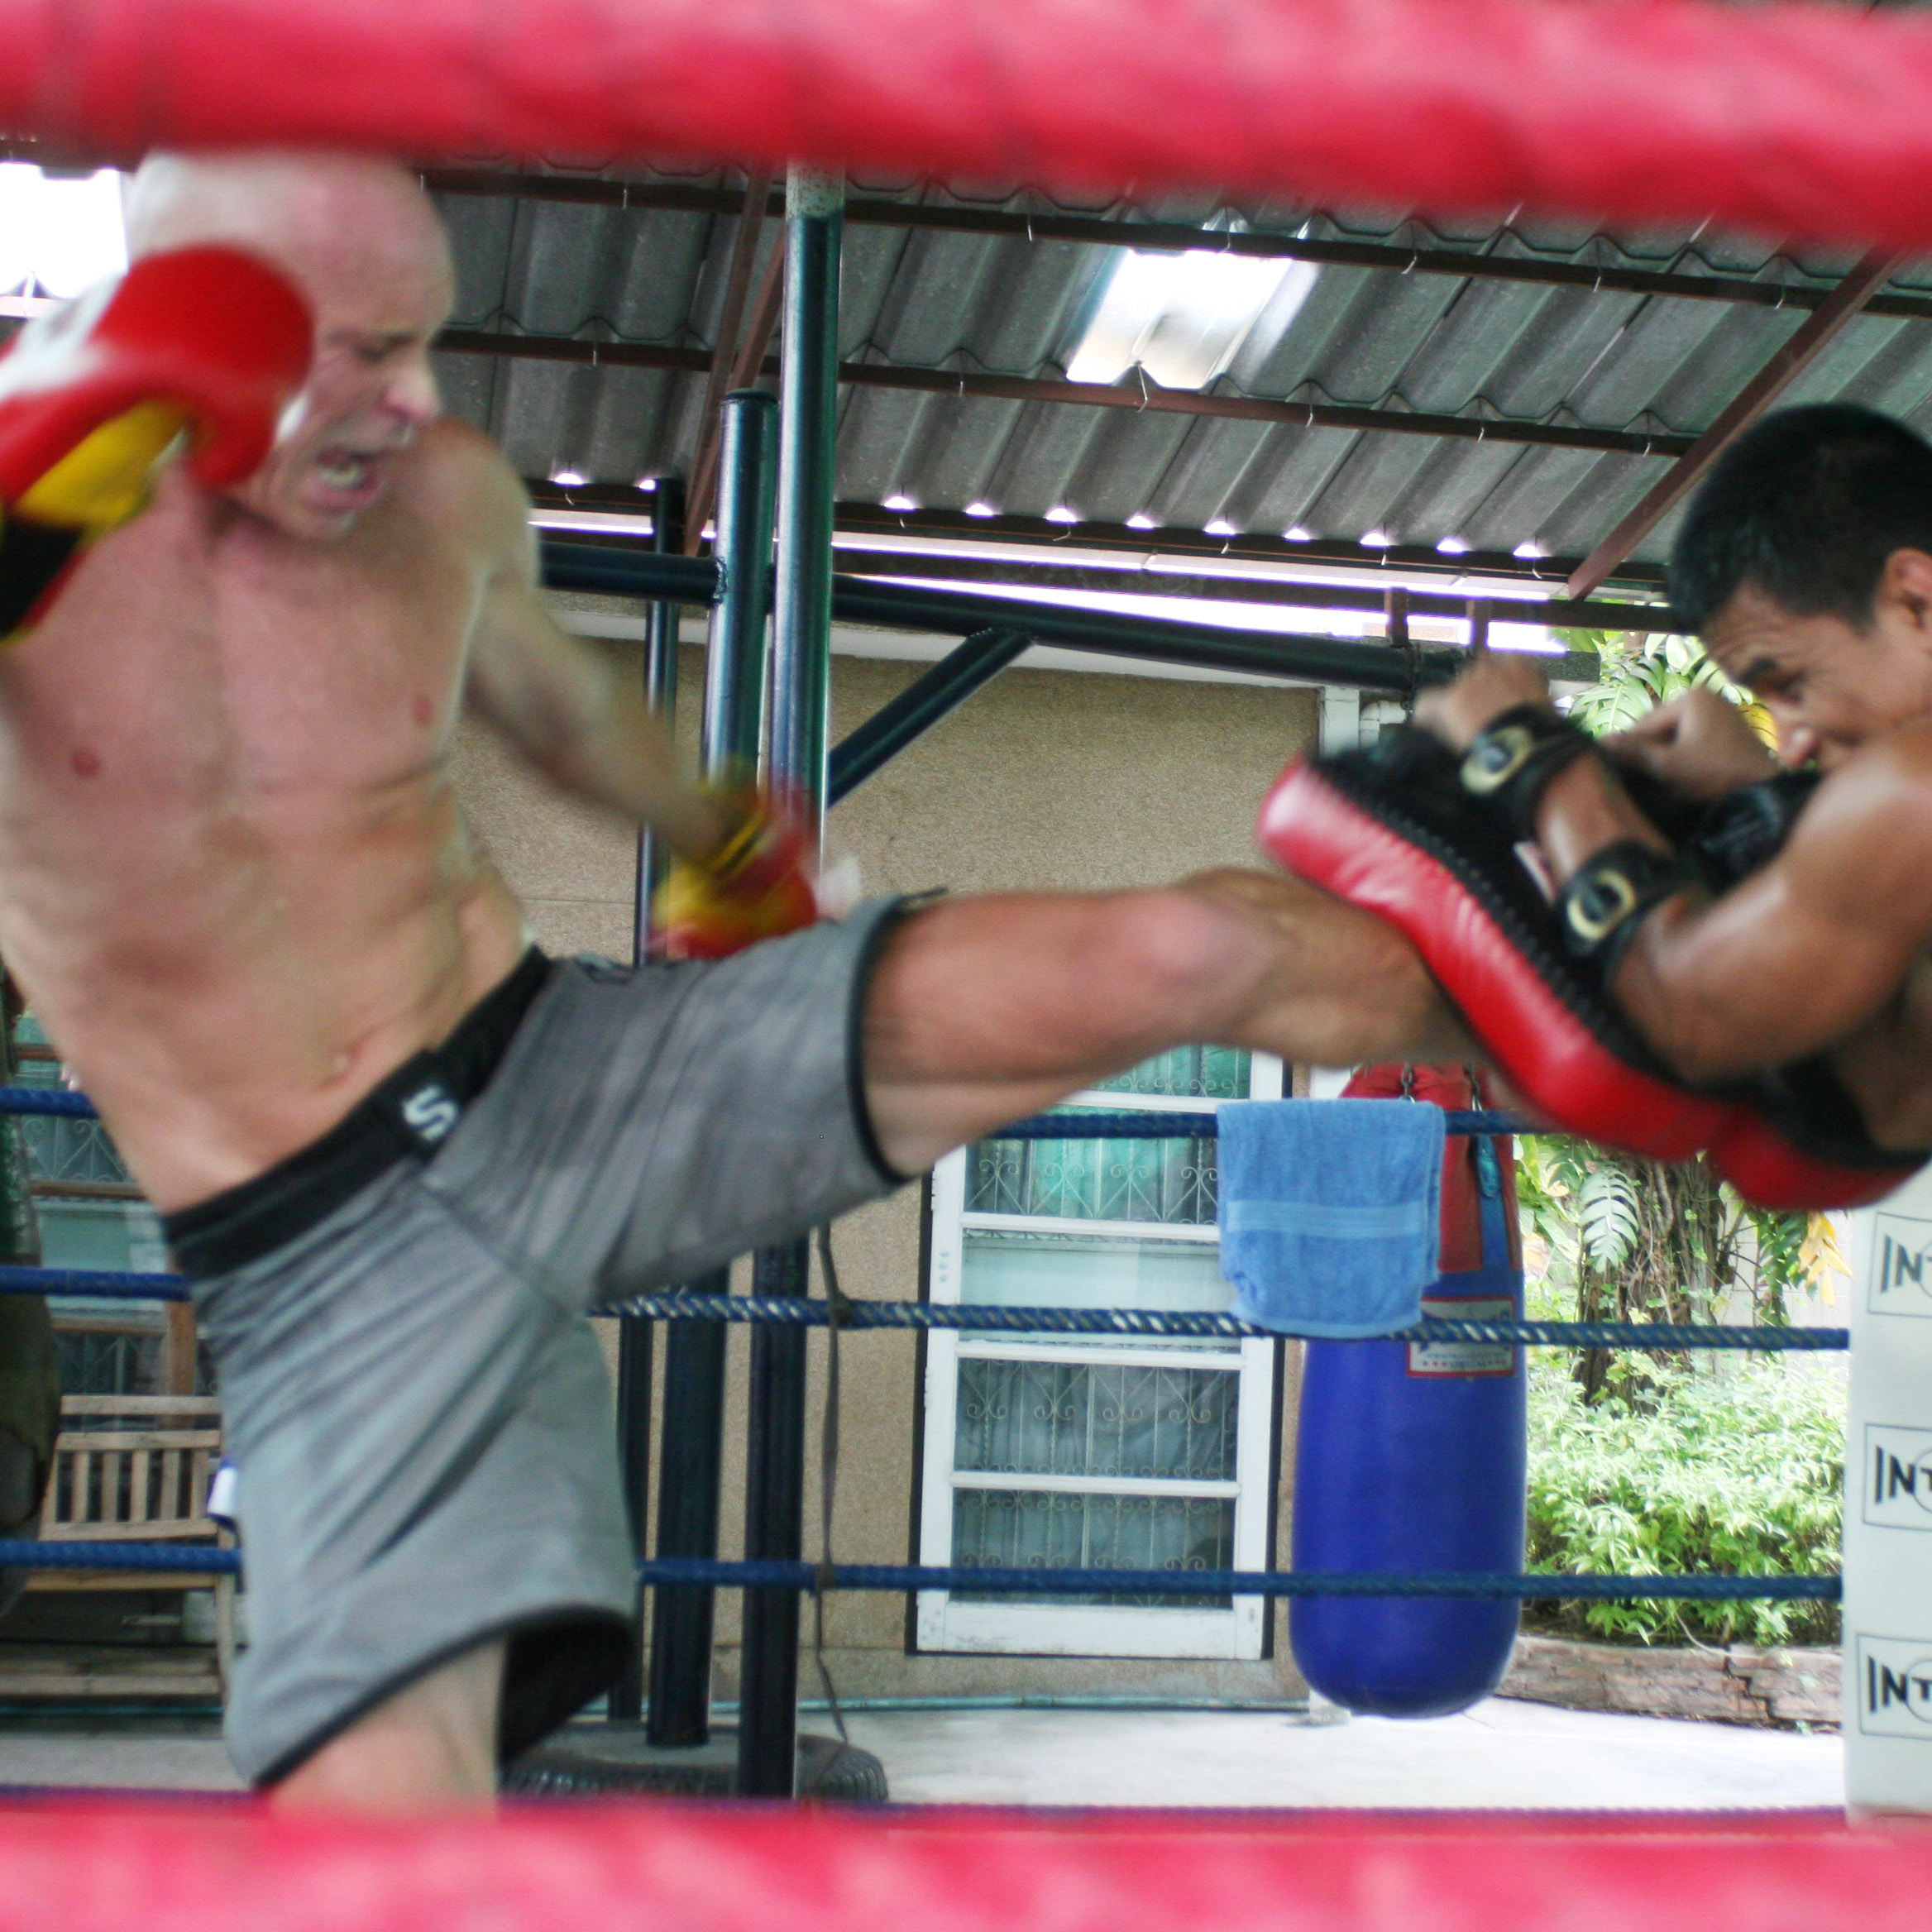 Ajarn Dan training in Thailand.